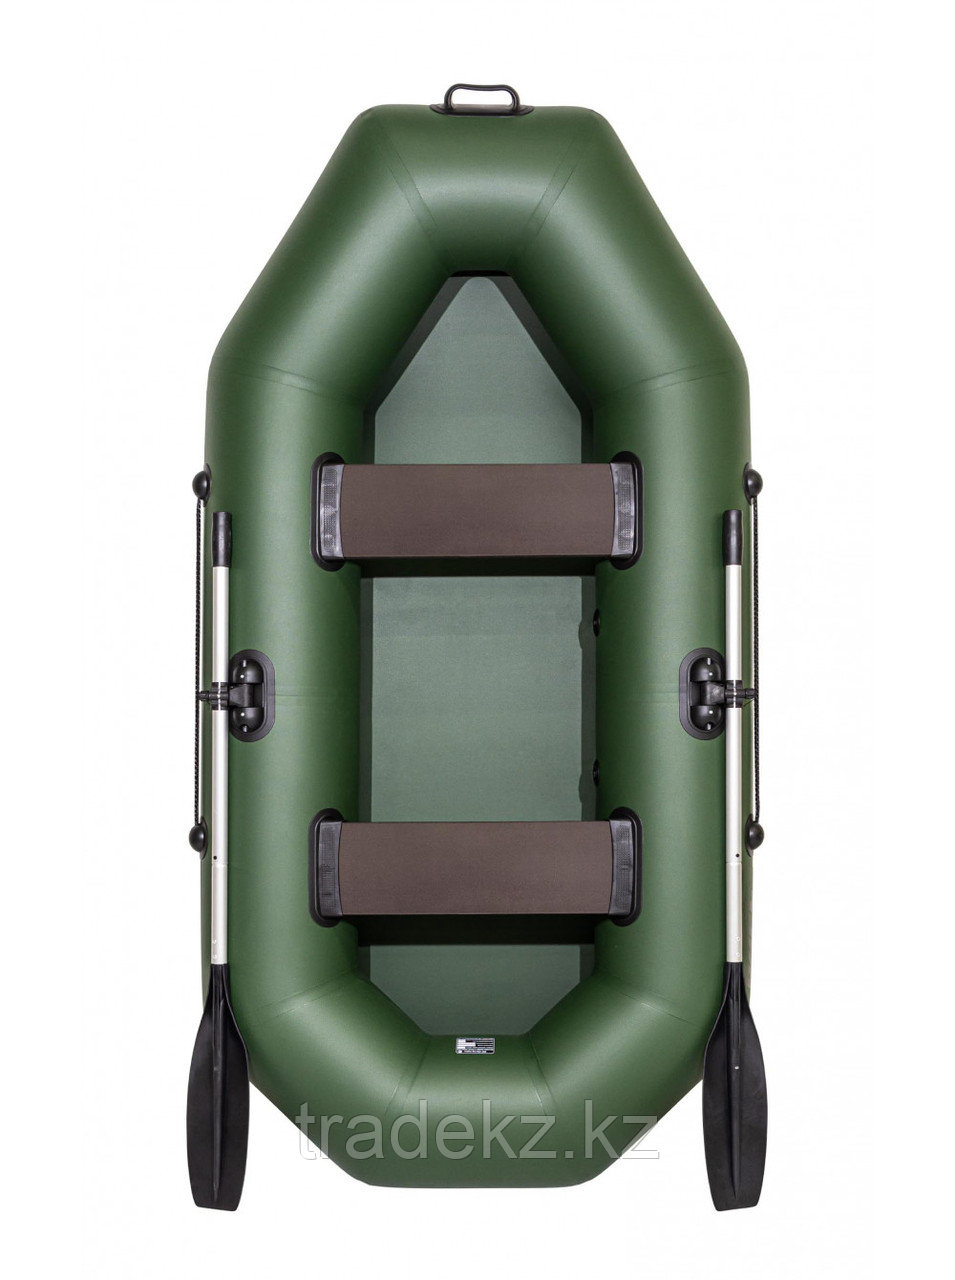 Лодка ПВХ Барс 240 зеленый